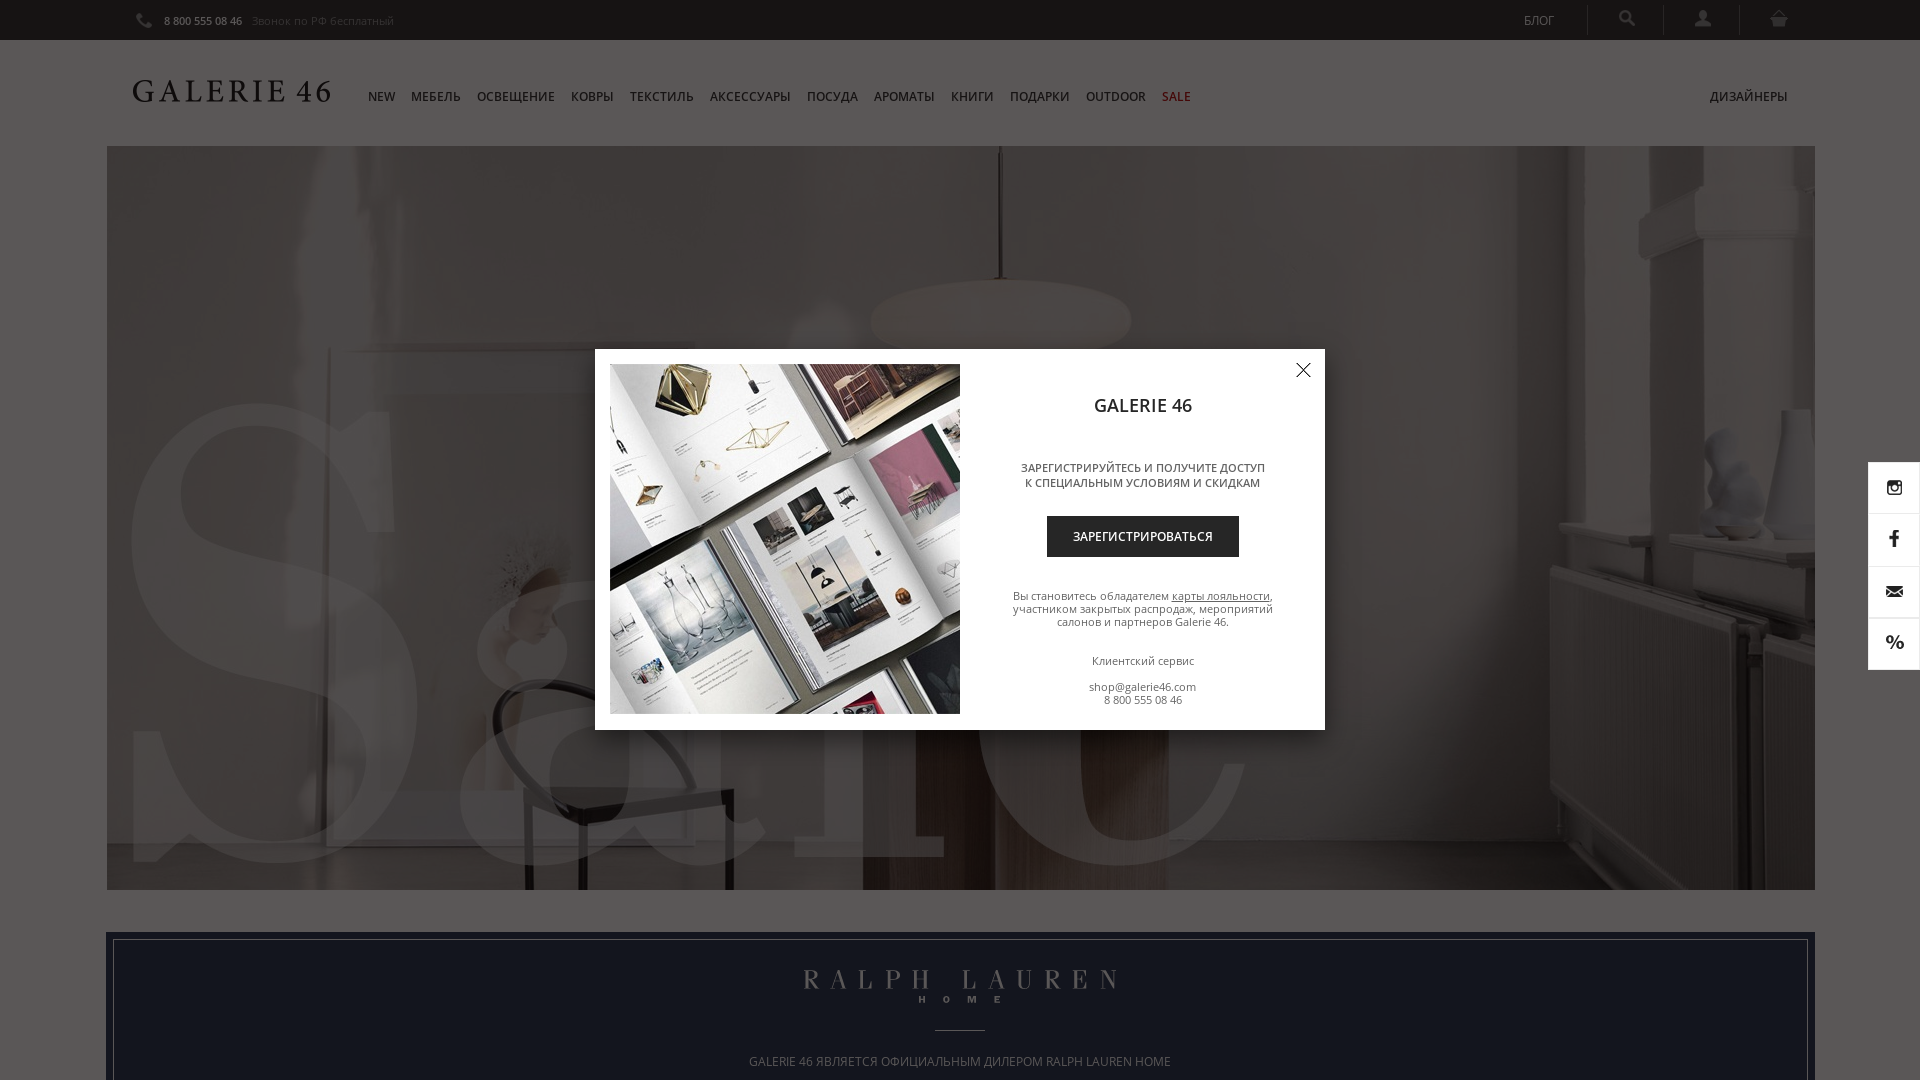 Galerie46 website